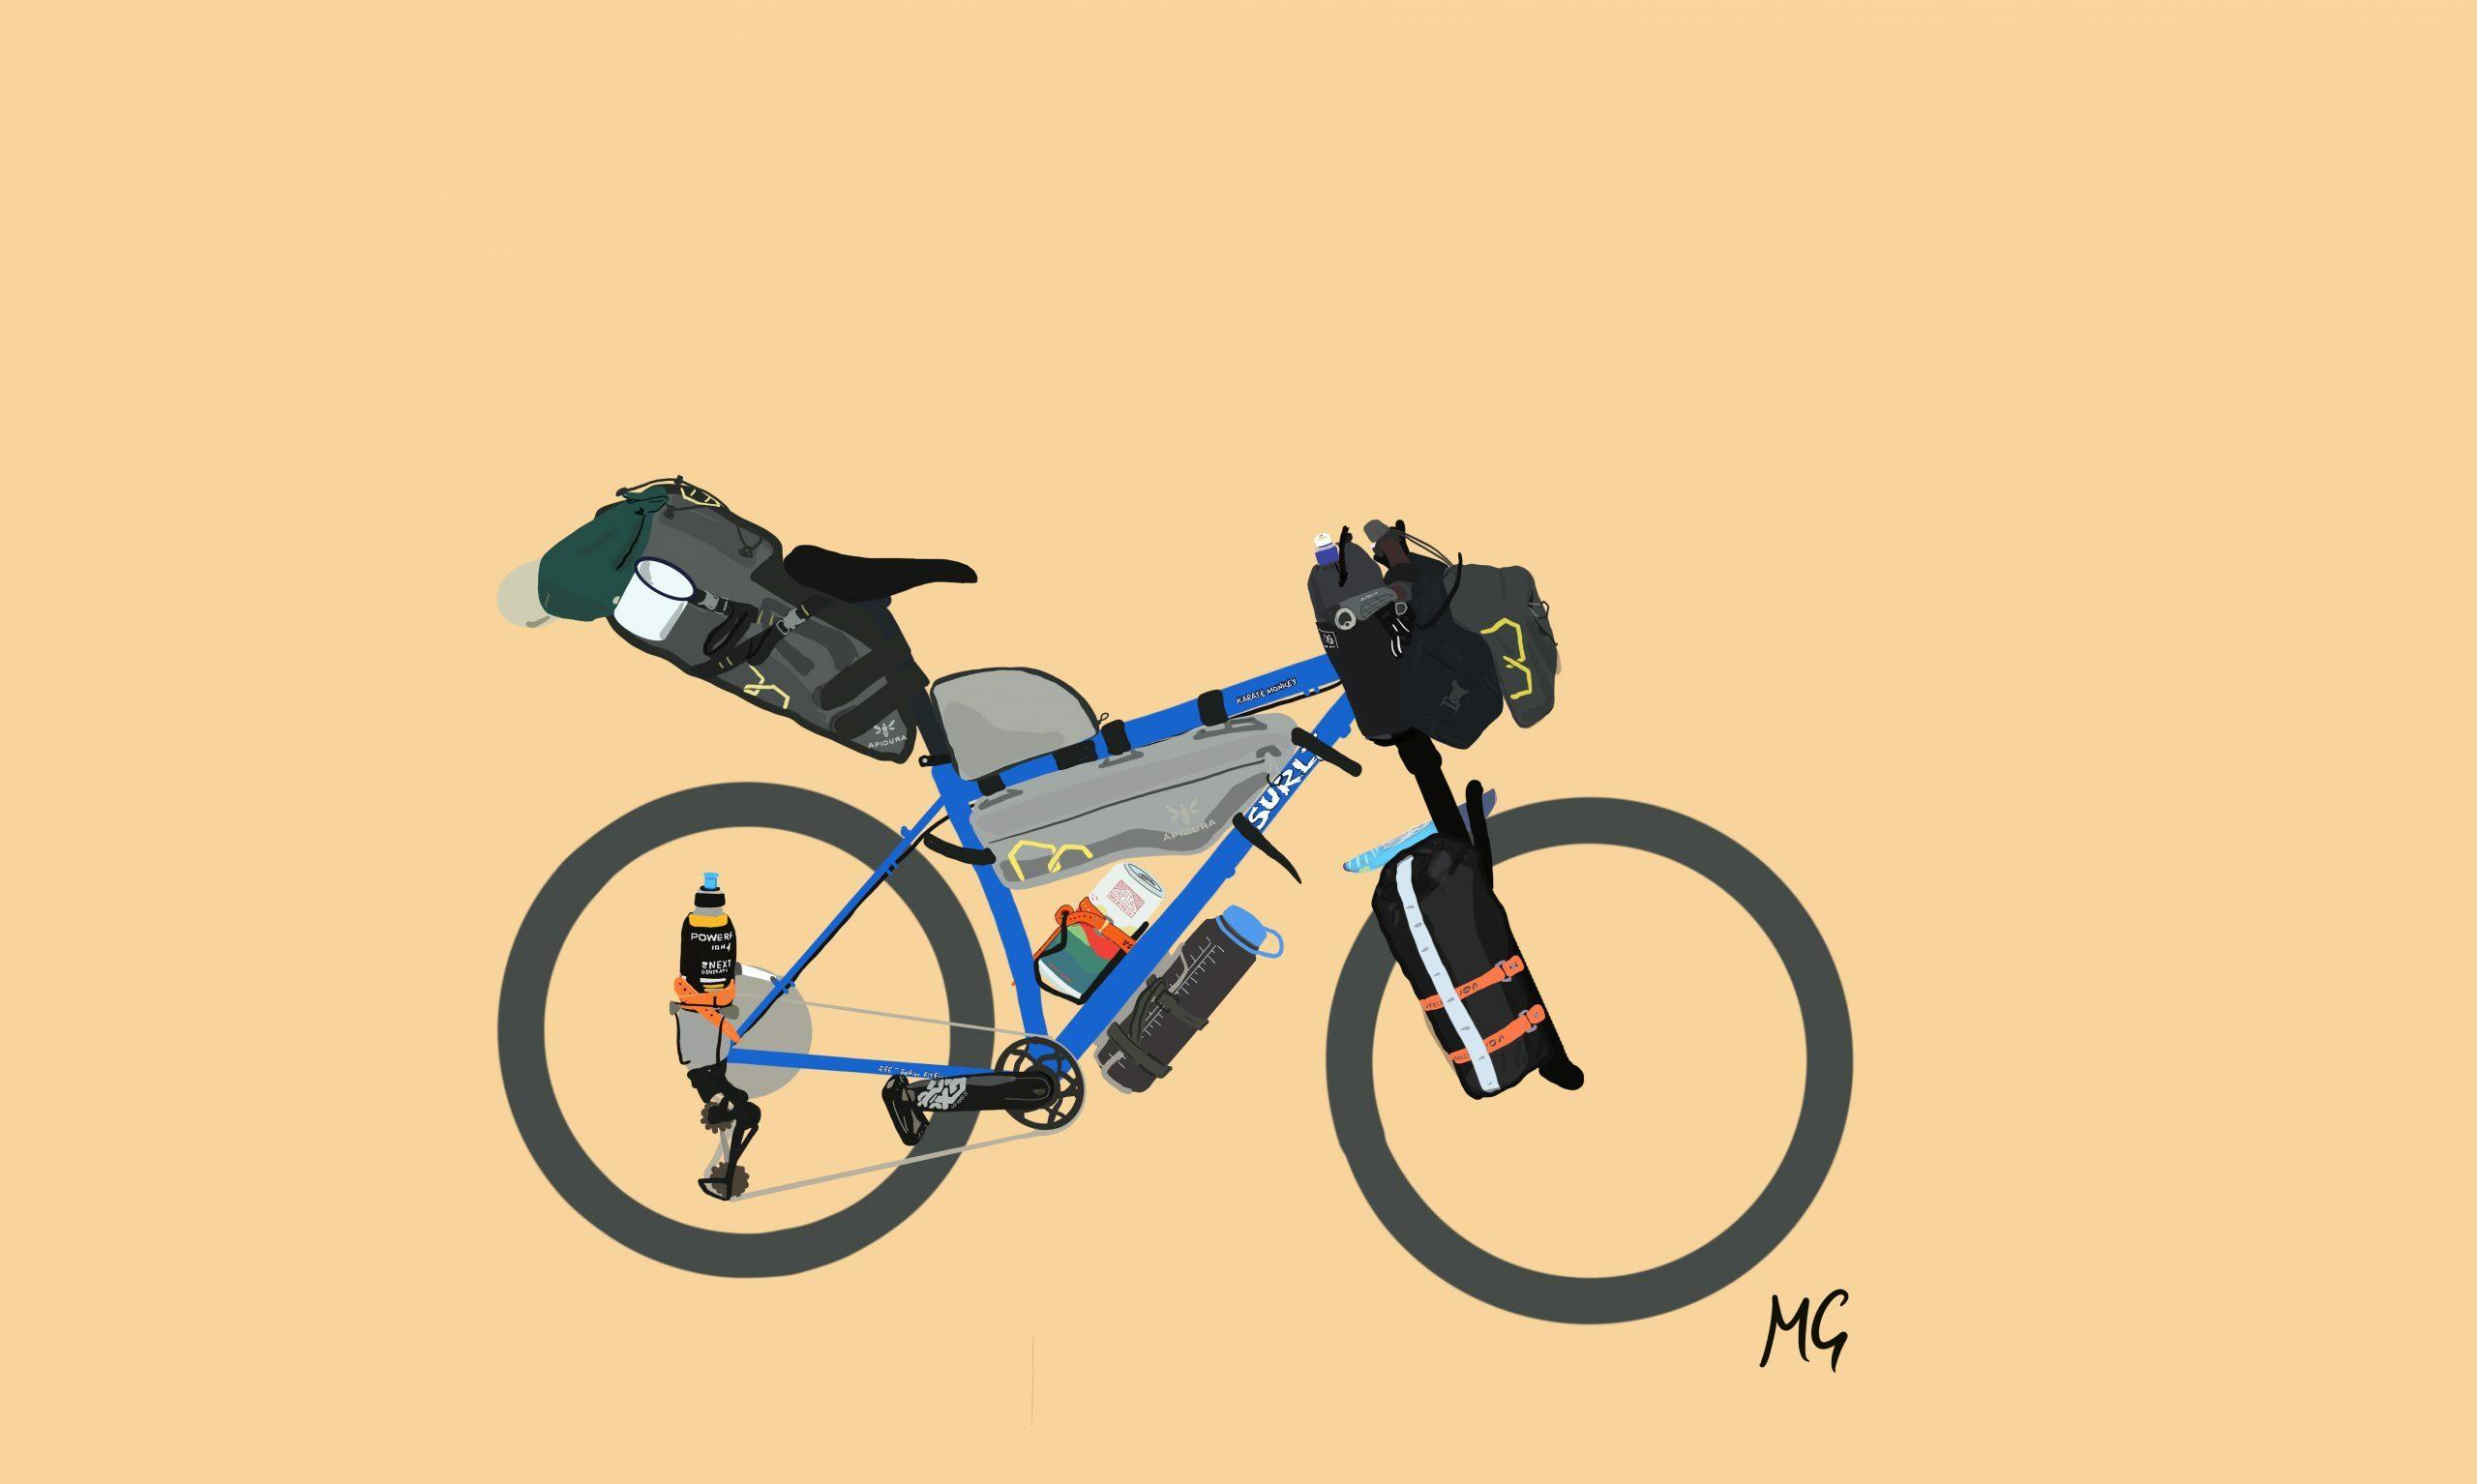 Creative bike people @Mattiedrawsbikes Mattie draws bikes bikepacking illustrations using procreate